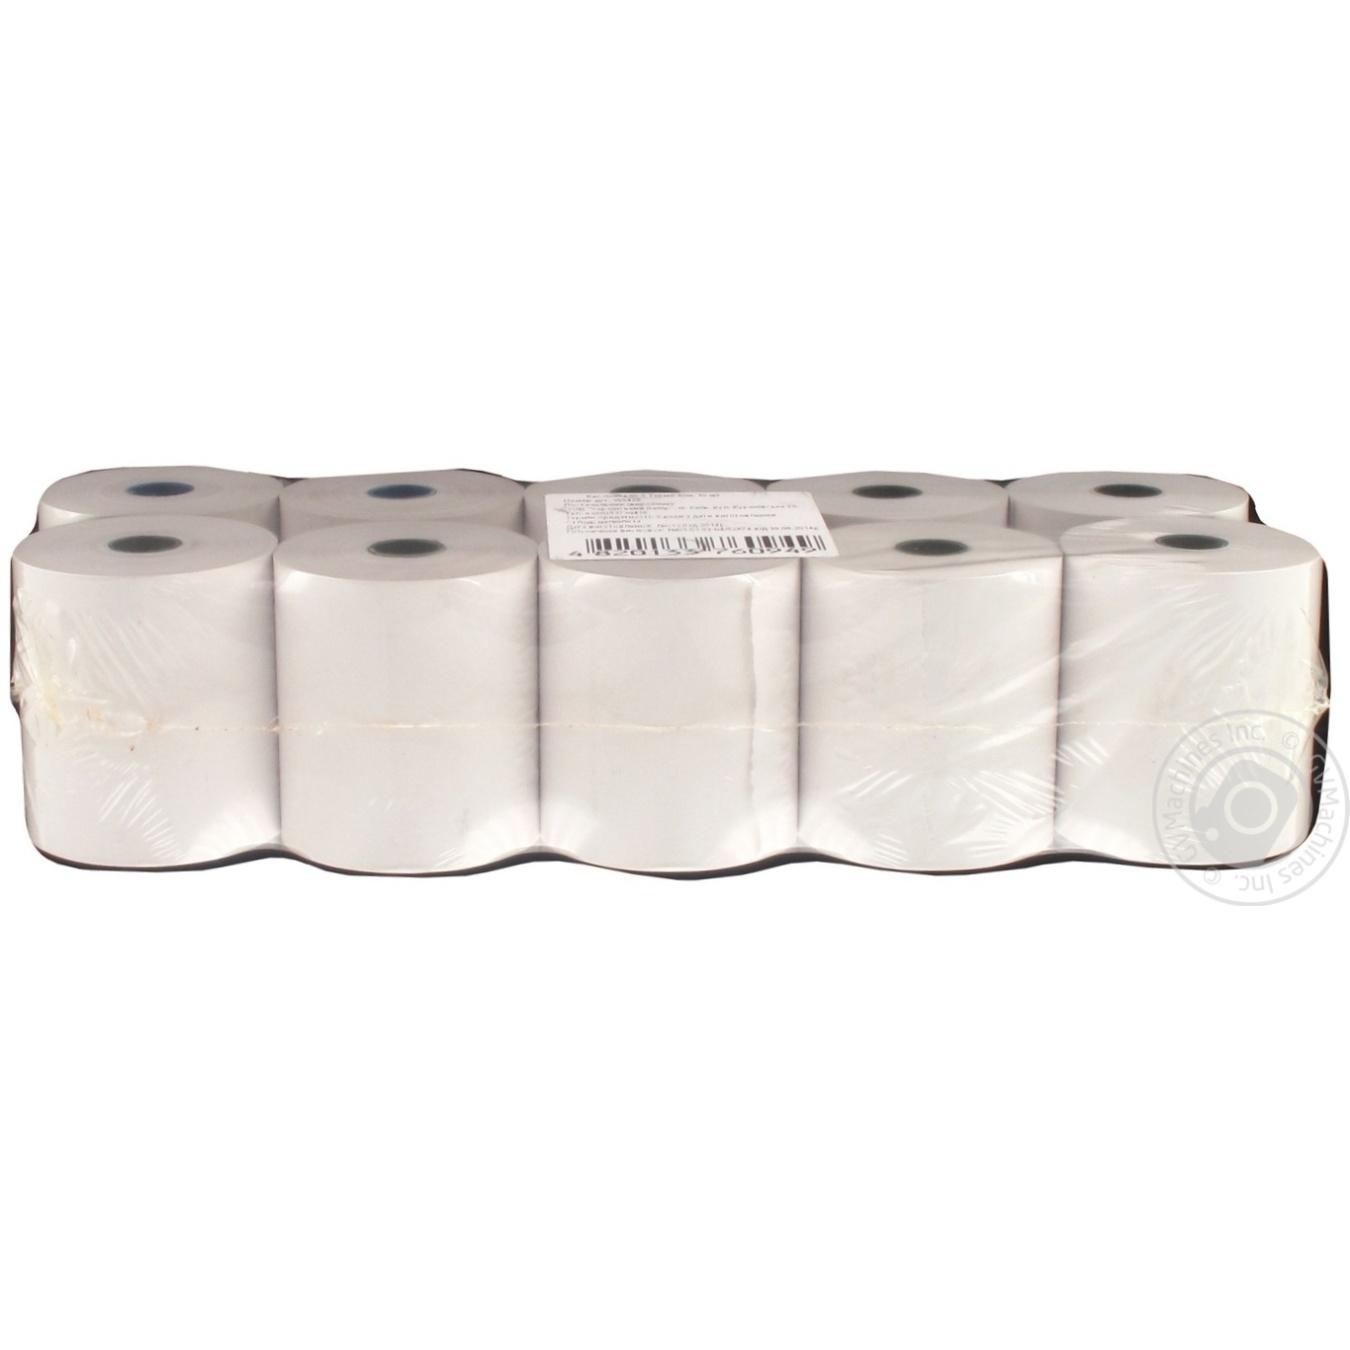 Кассовая лента 59,5 Термо 40м 10шт